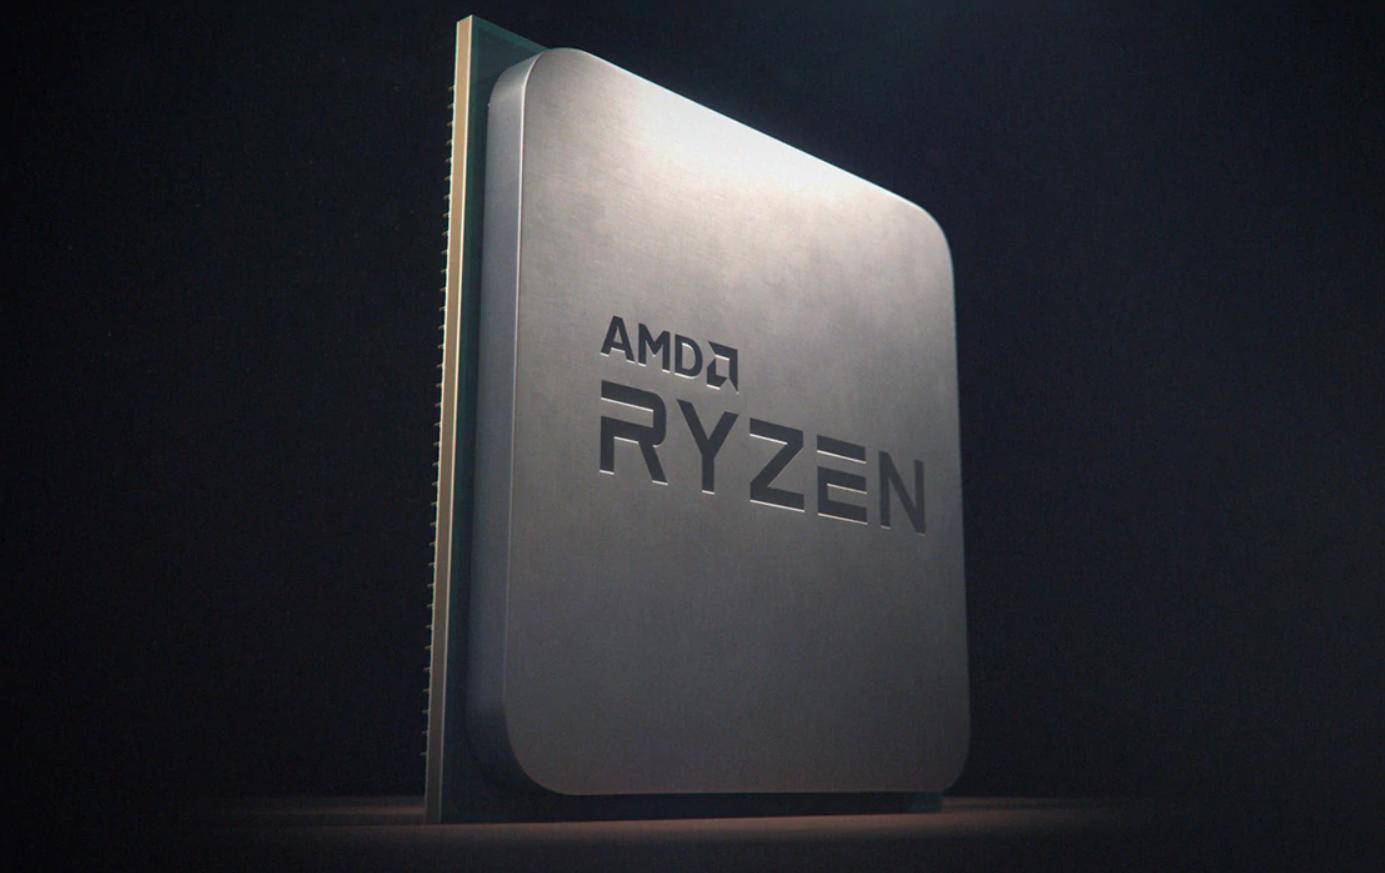 AMD Cuts Its Full-Year Guidance | The Motley Fool